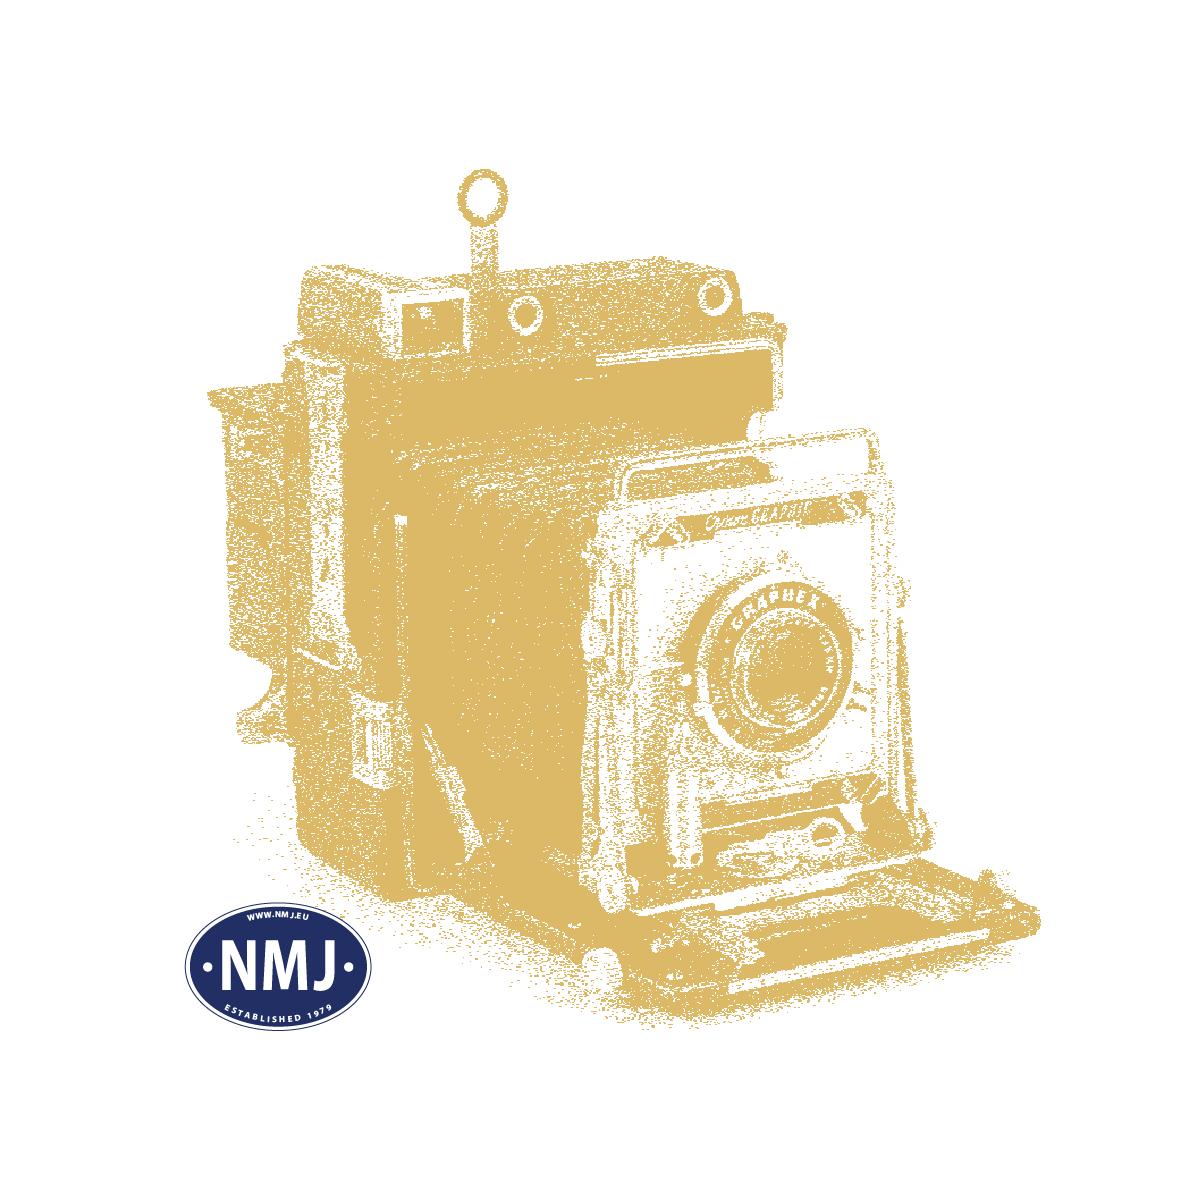 NMJSE1089 - NMJ Superline SJ E 1089